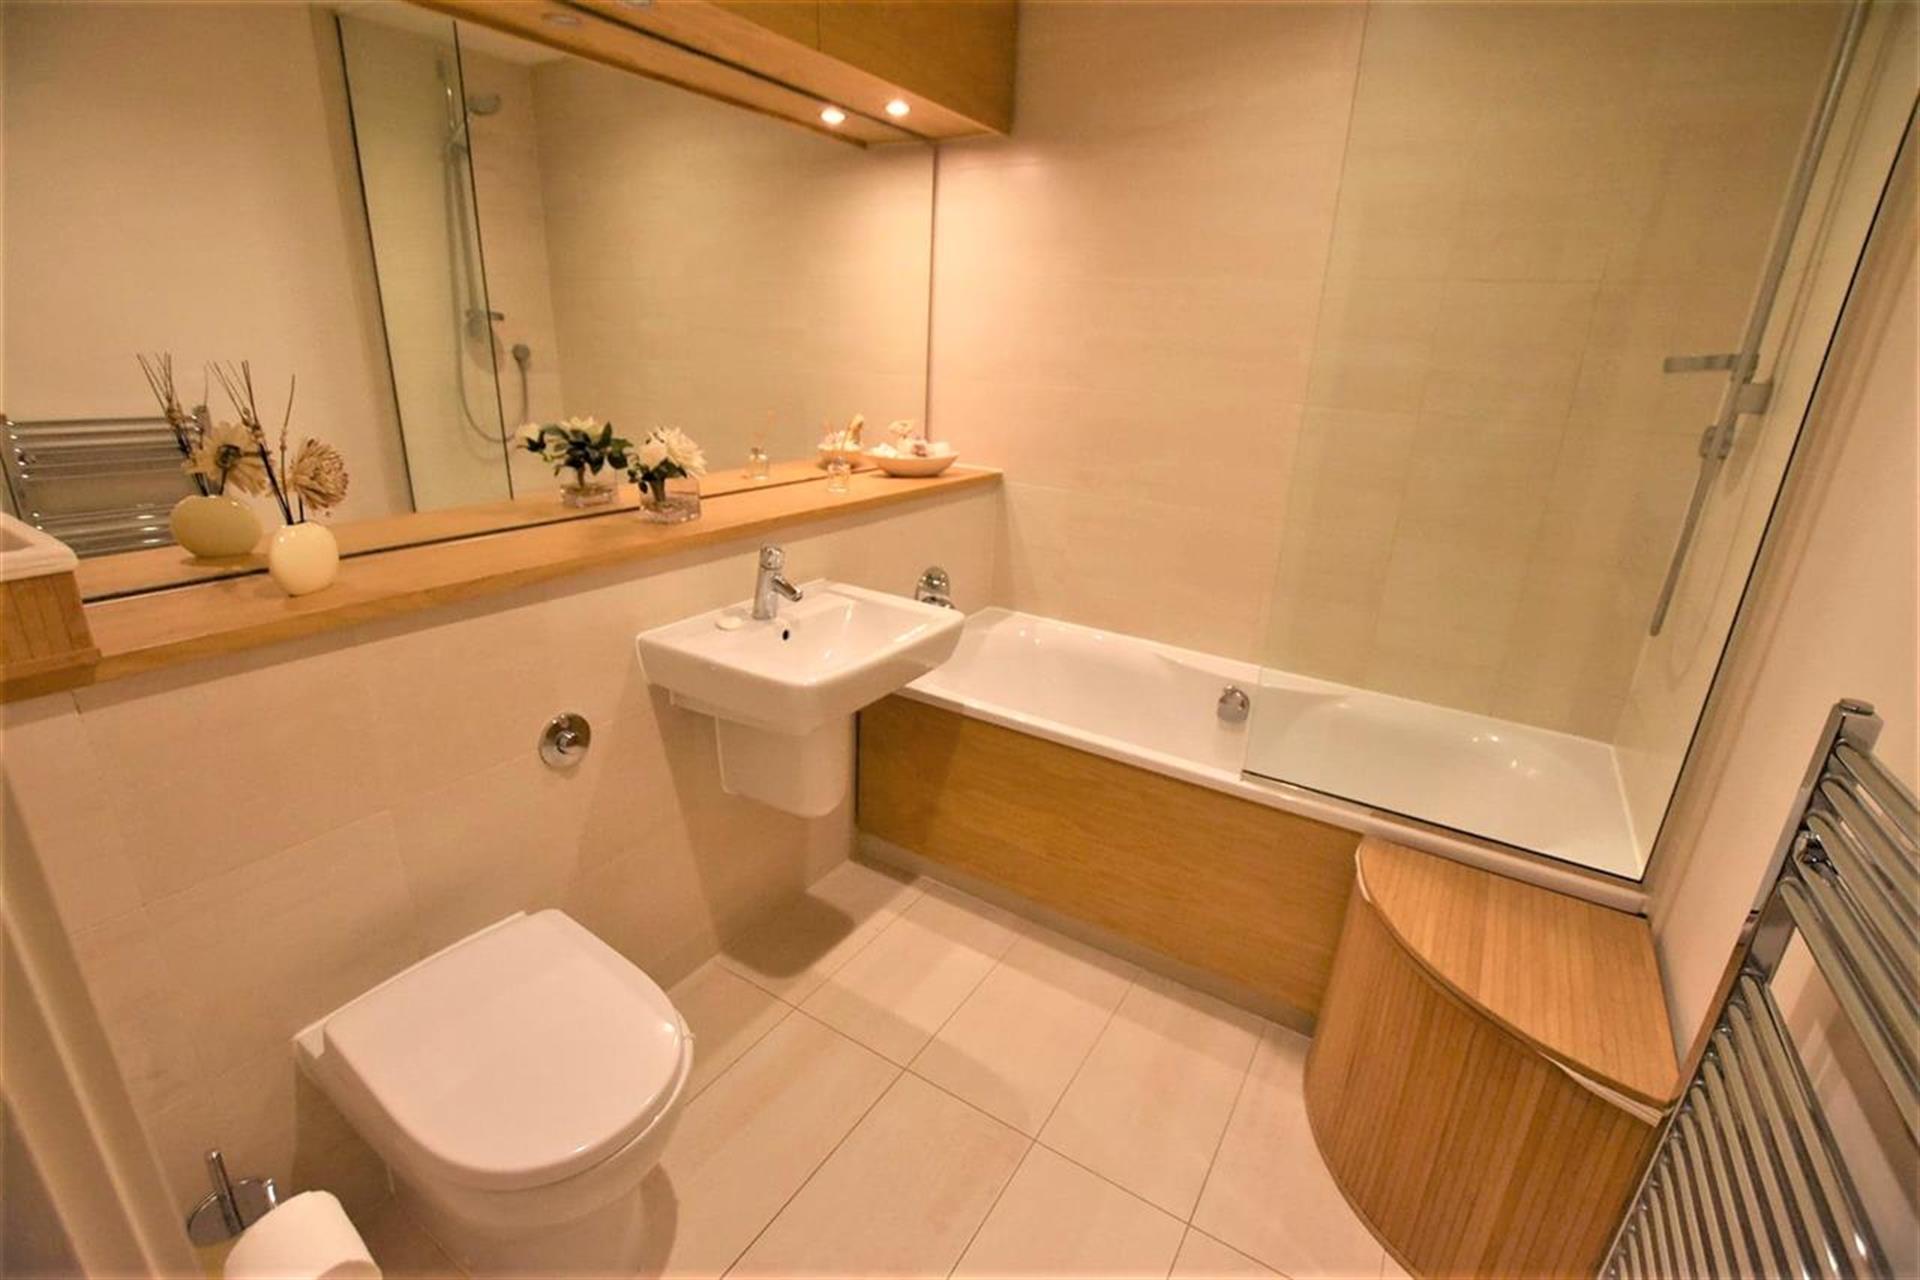 2 Bedroom Apartment Flat / Apartment For Sale - Bathroom